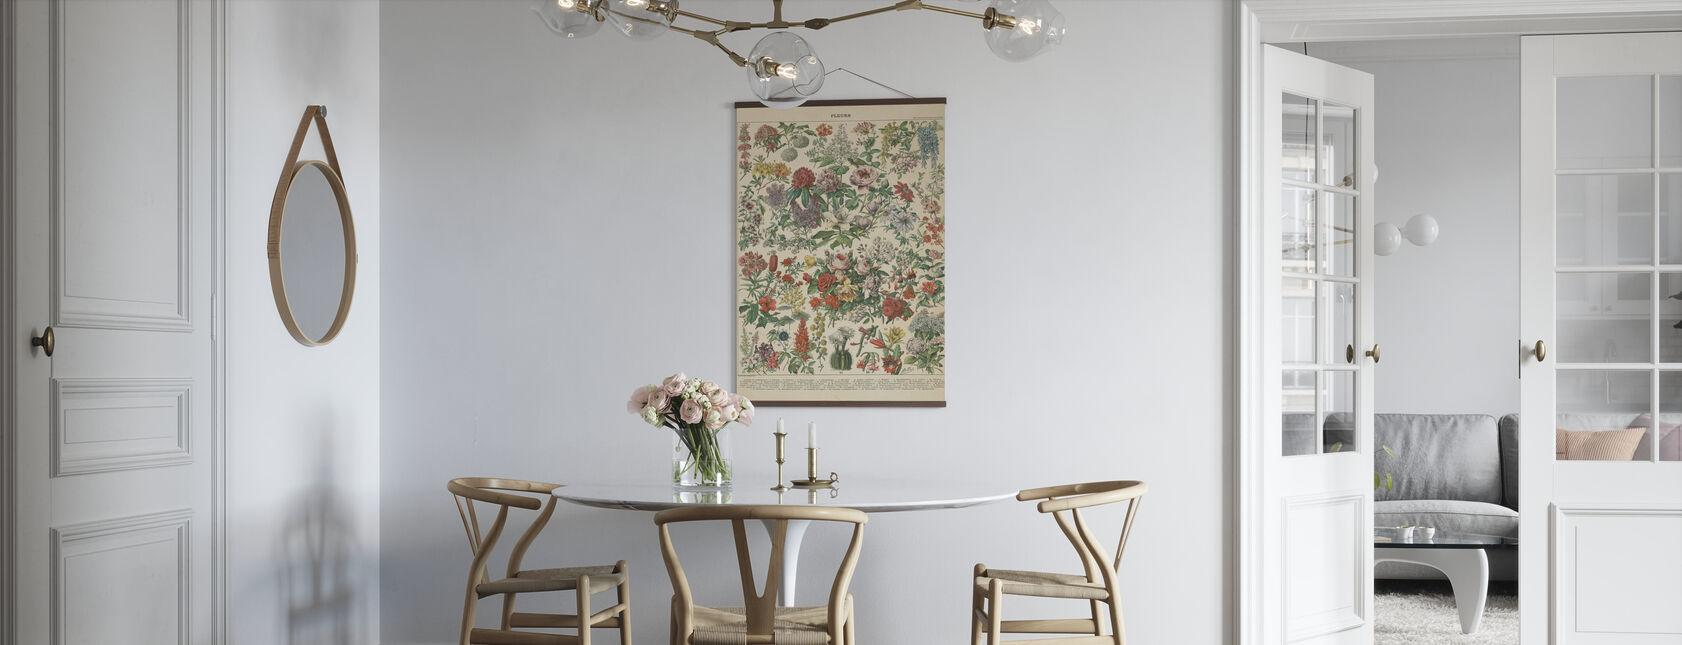 Grafico floreale francese - Poster - Cucina